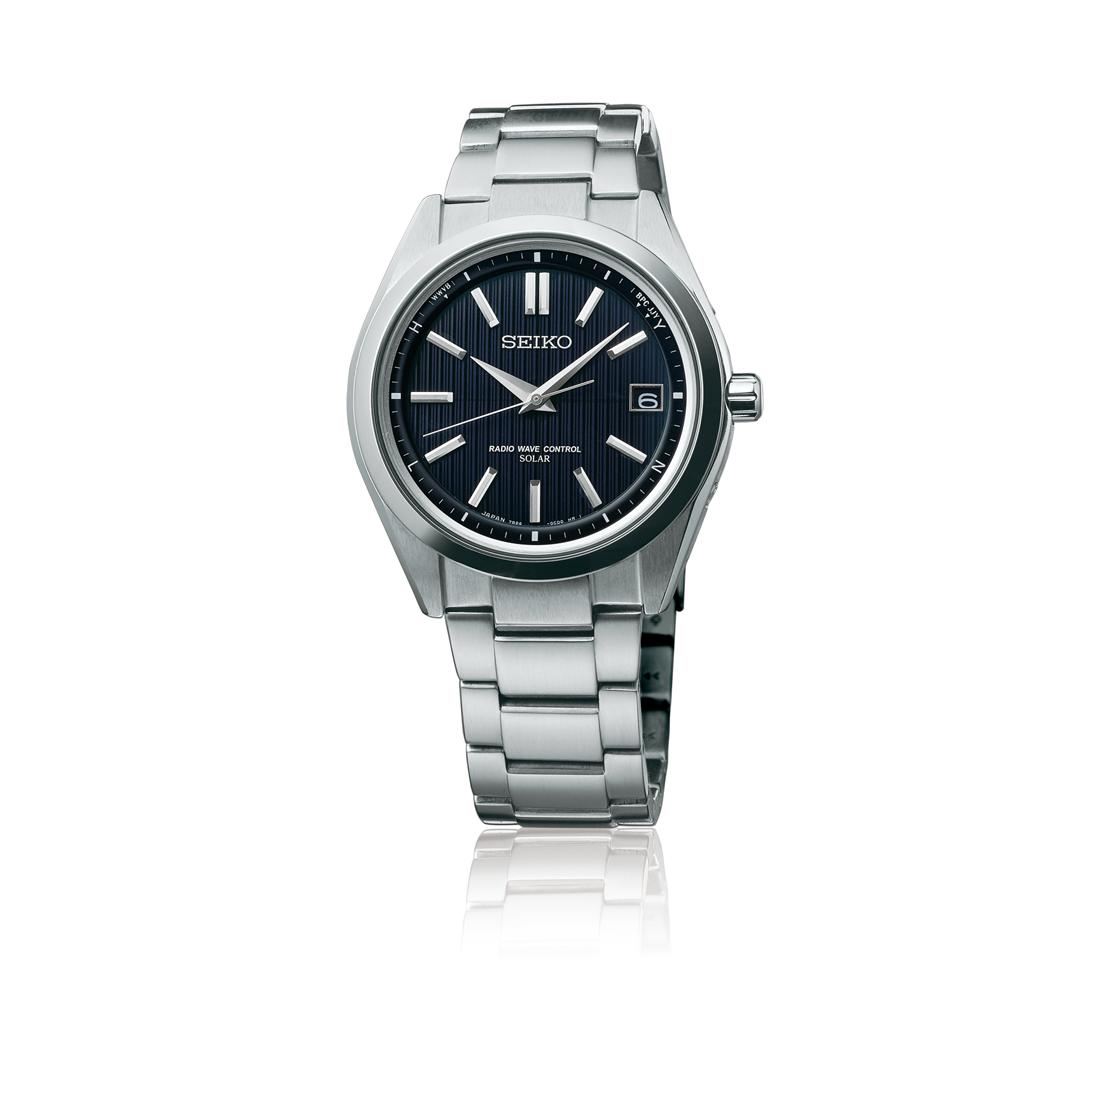 new styles e004d e6864 SAGZ083 | Brightz | Seiko watch corporation | jam seiko ...